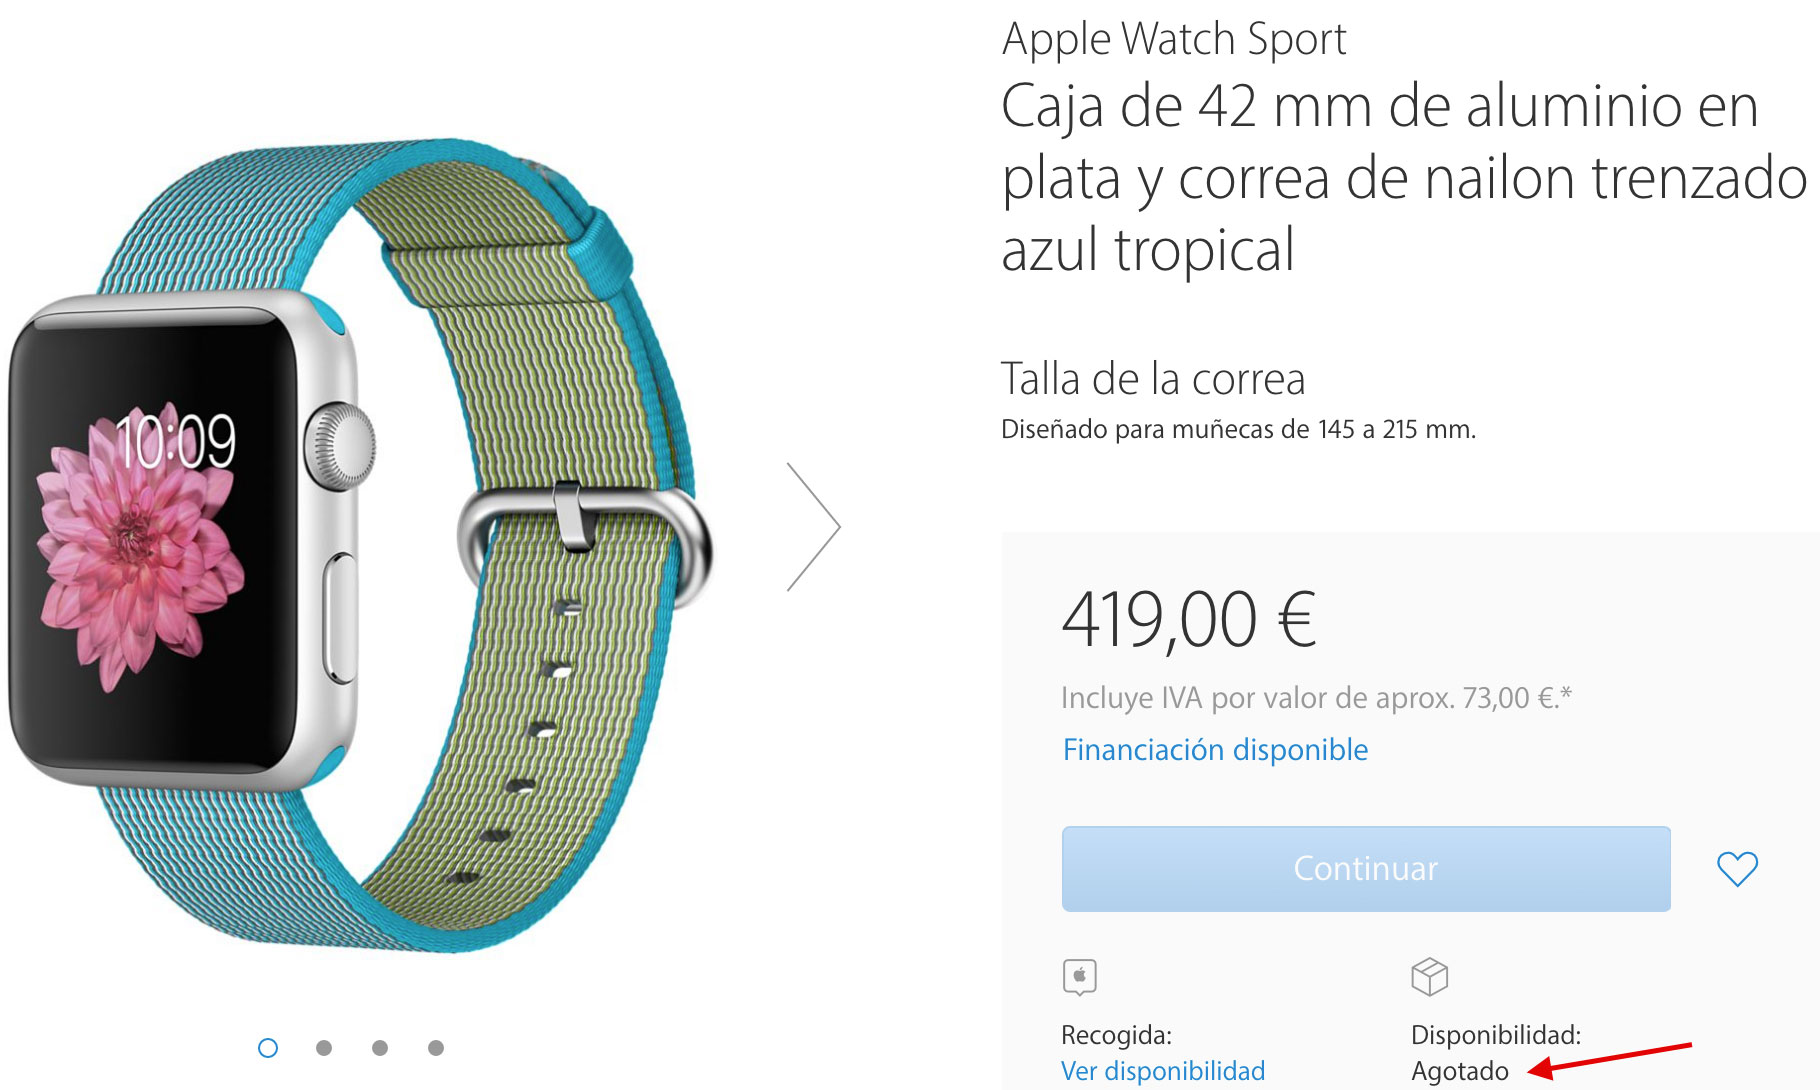 Apple Watch agotado